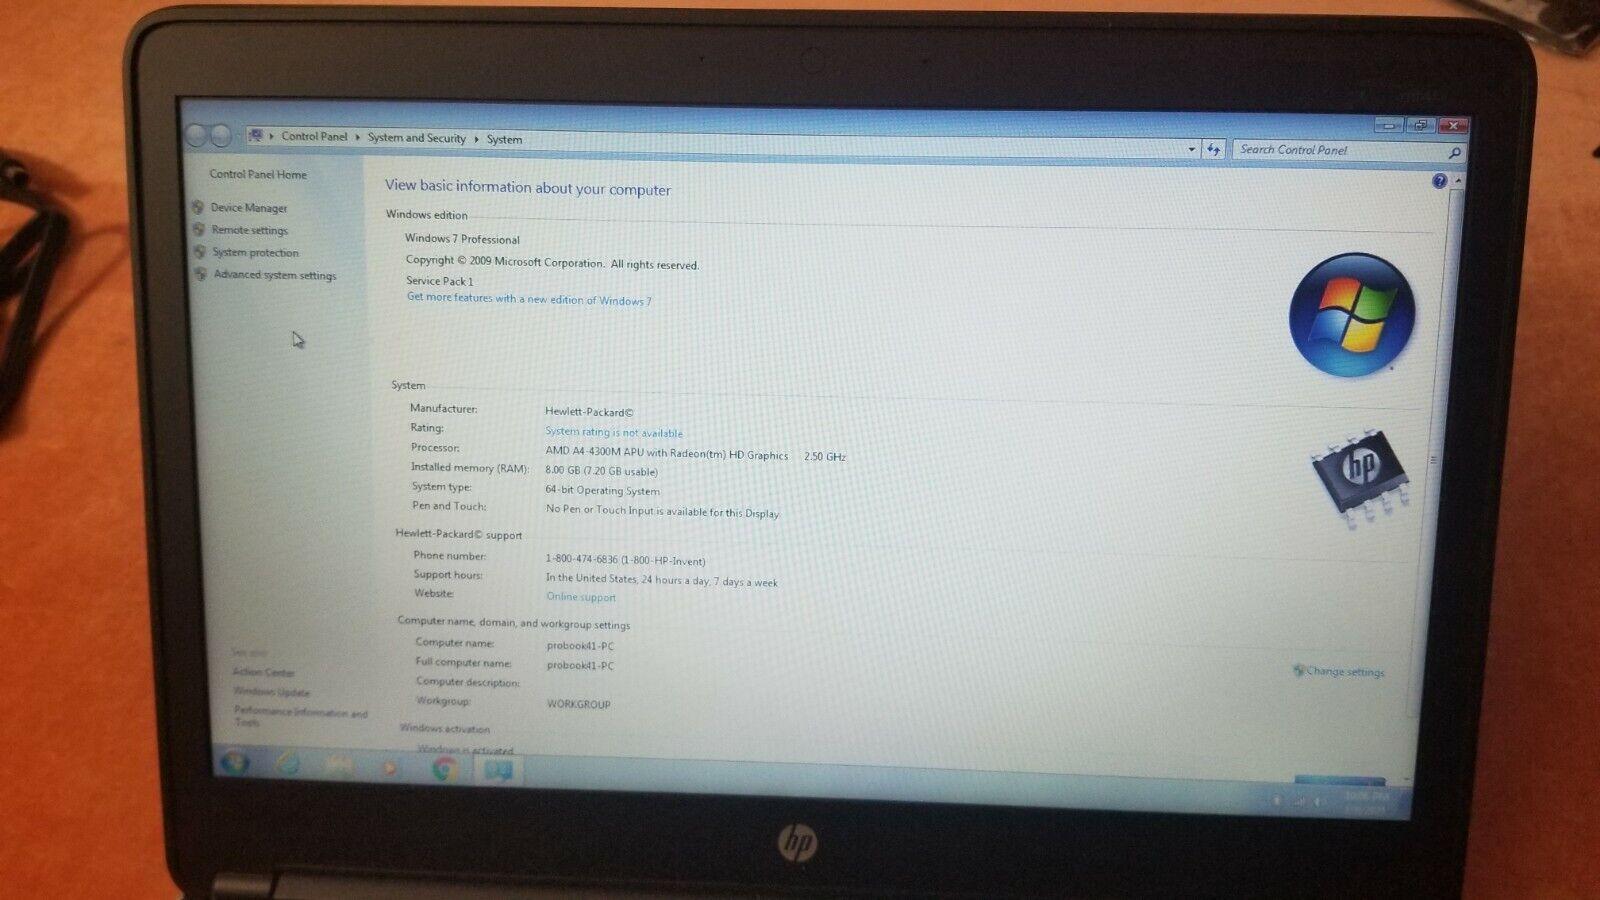 HP ProBook Mt41 Laptop 14 A4-4300M APU HD Graphics 2.50GHz 8GB Ram 320GB HDD - $119.00